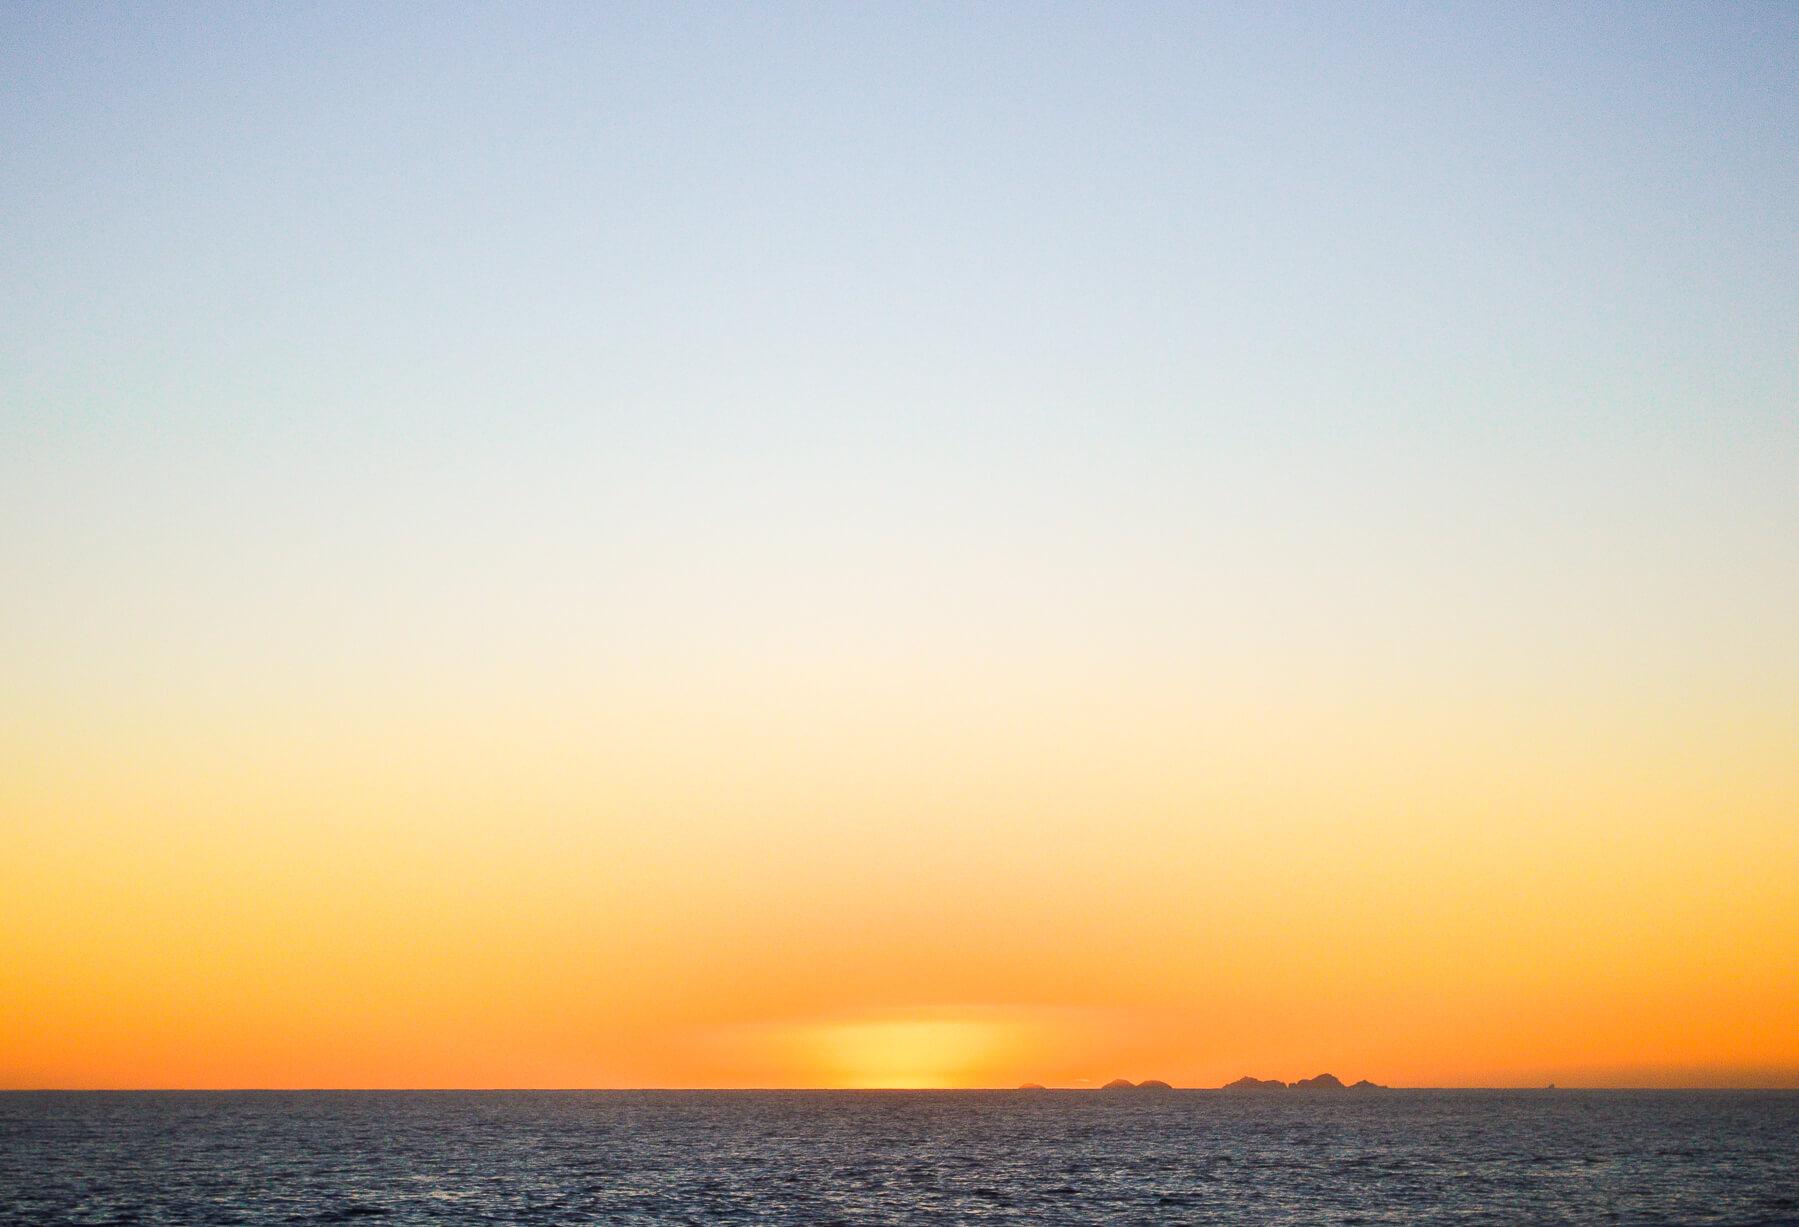 Yellow sunset steaming below the ocean